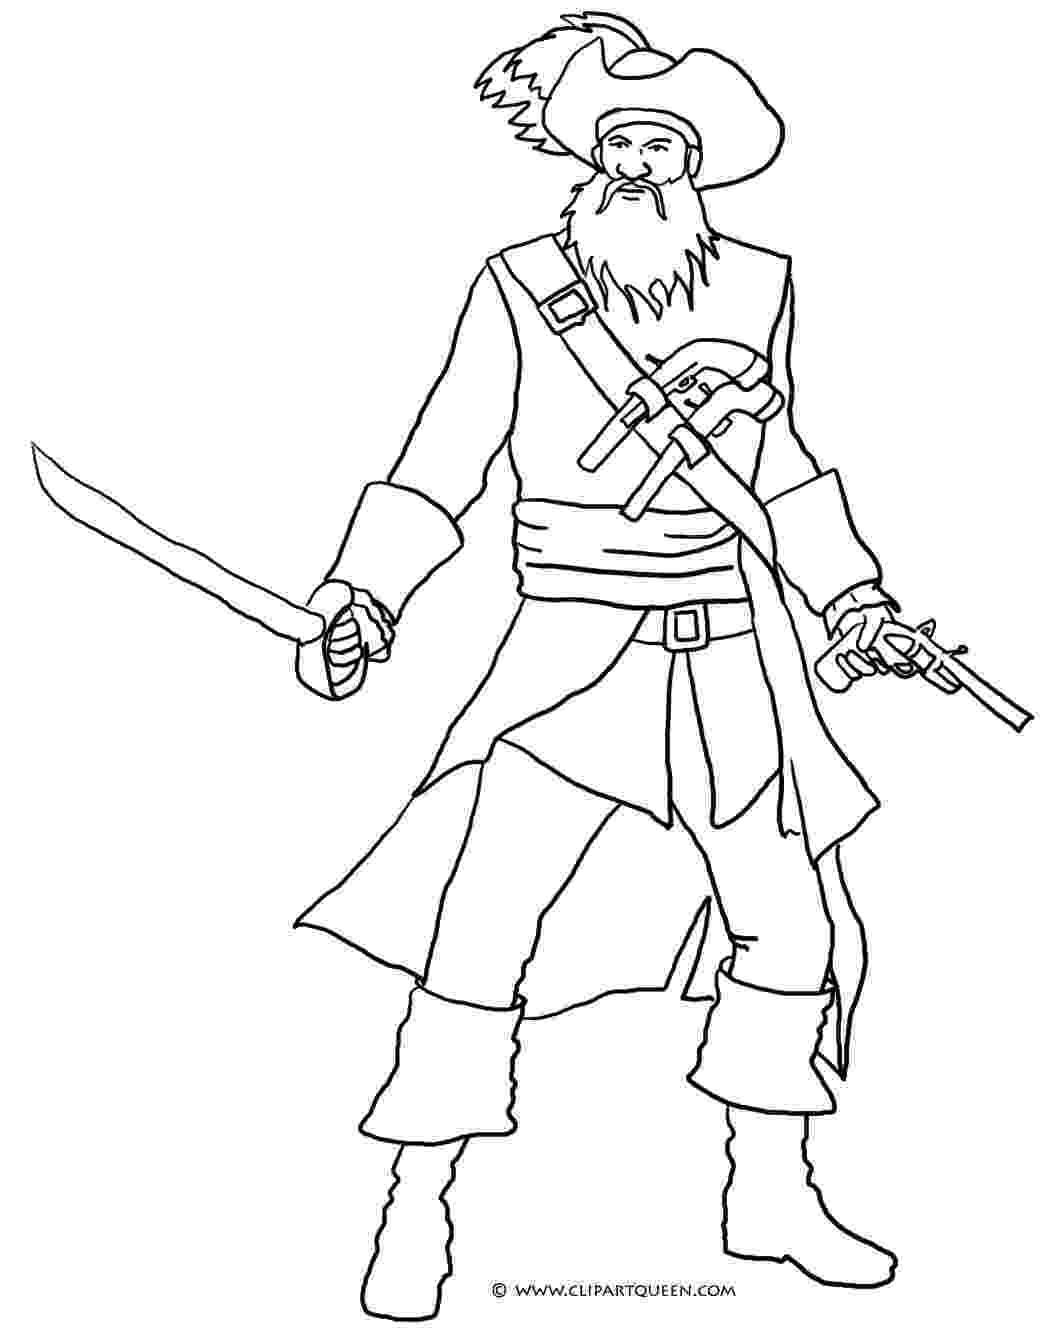 pirate coloring pirate coloring pages coloring pirate 1 2